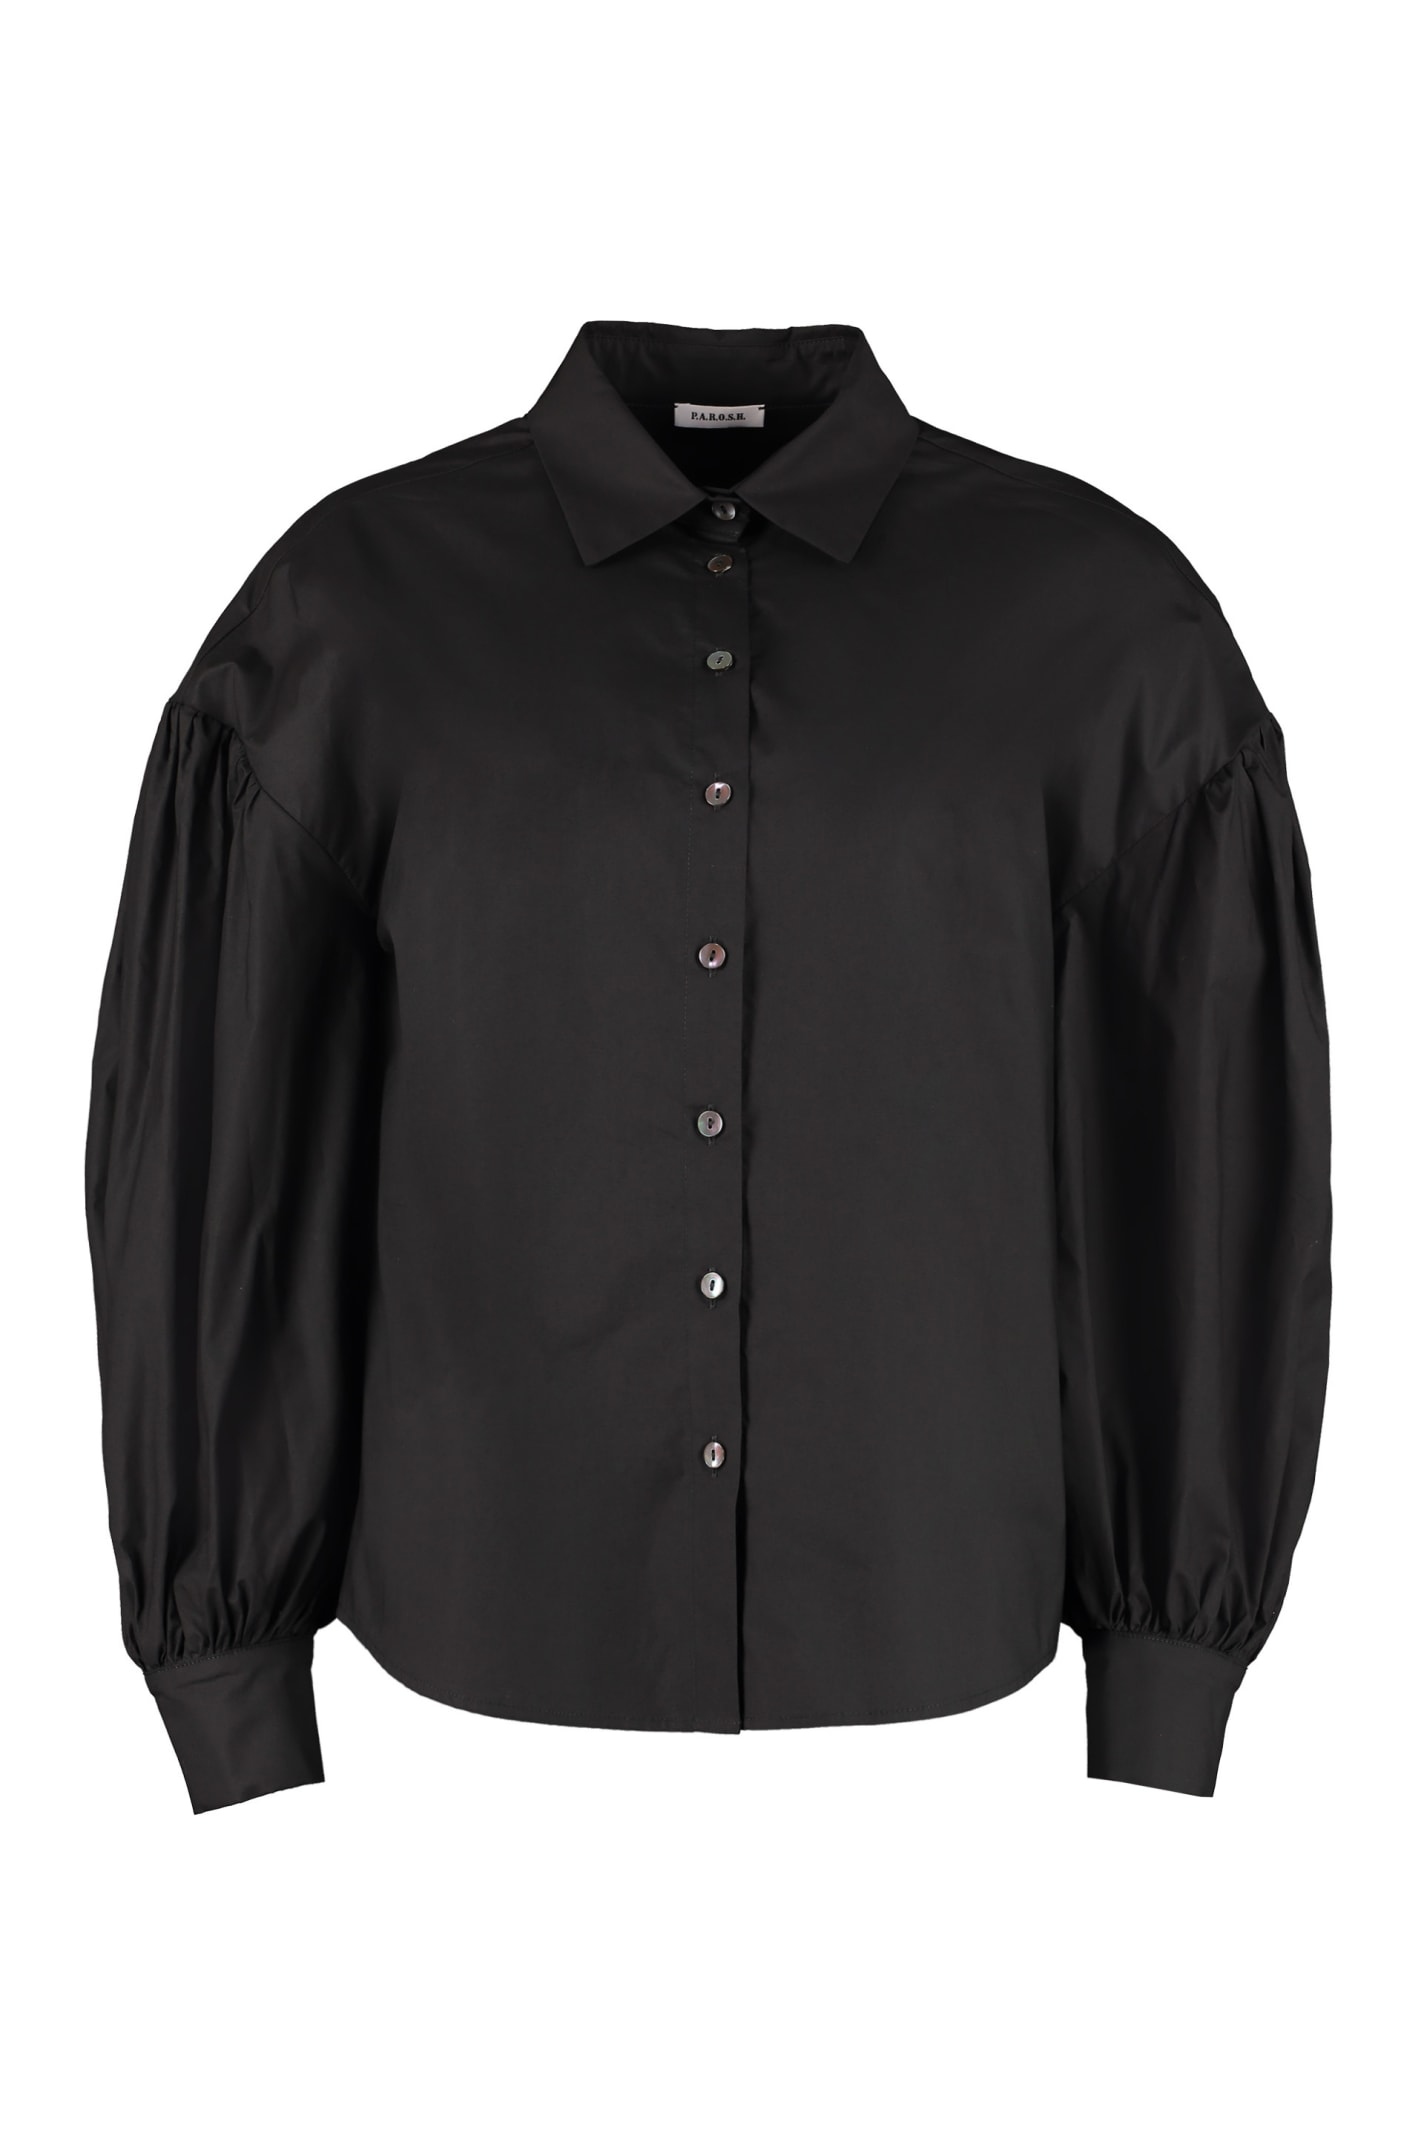 Parosh Long Sleeve Cotton Shirt